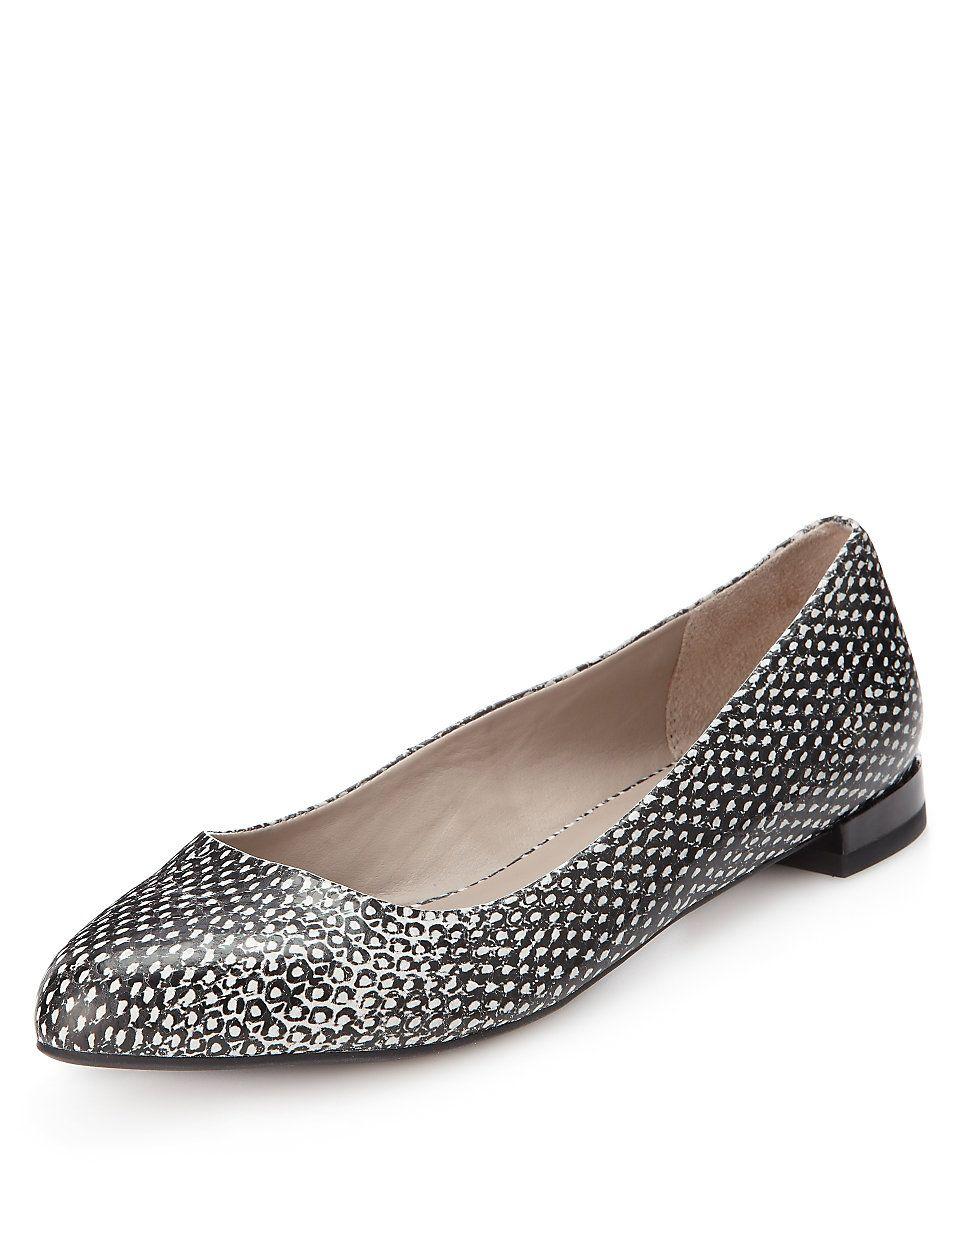 M&S | Footglove™ Leather Almond Toe Pumps | £39.50